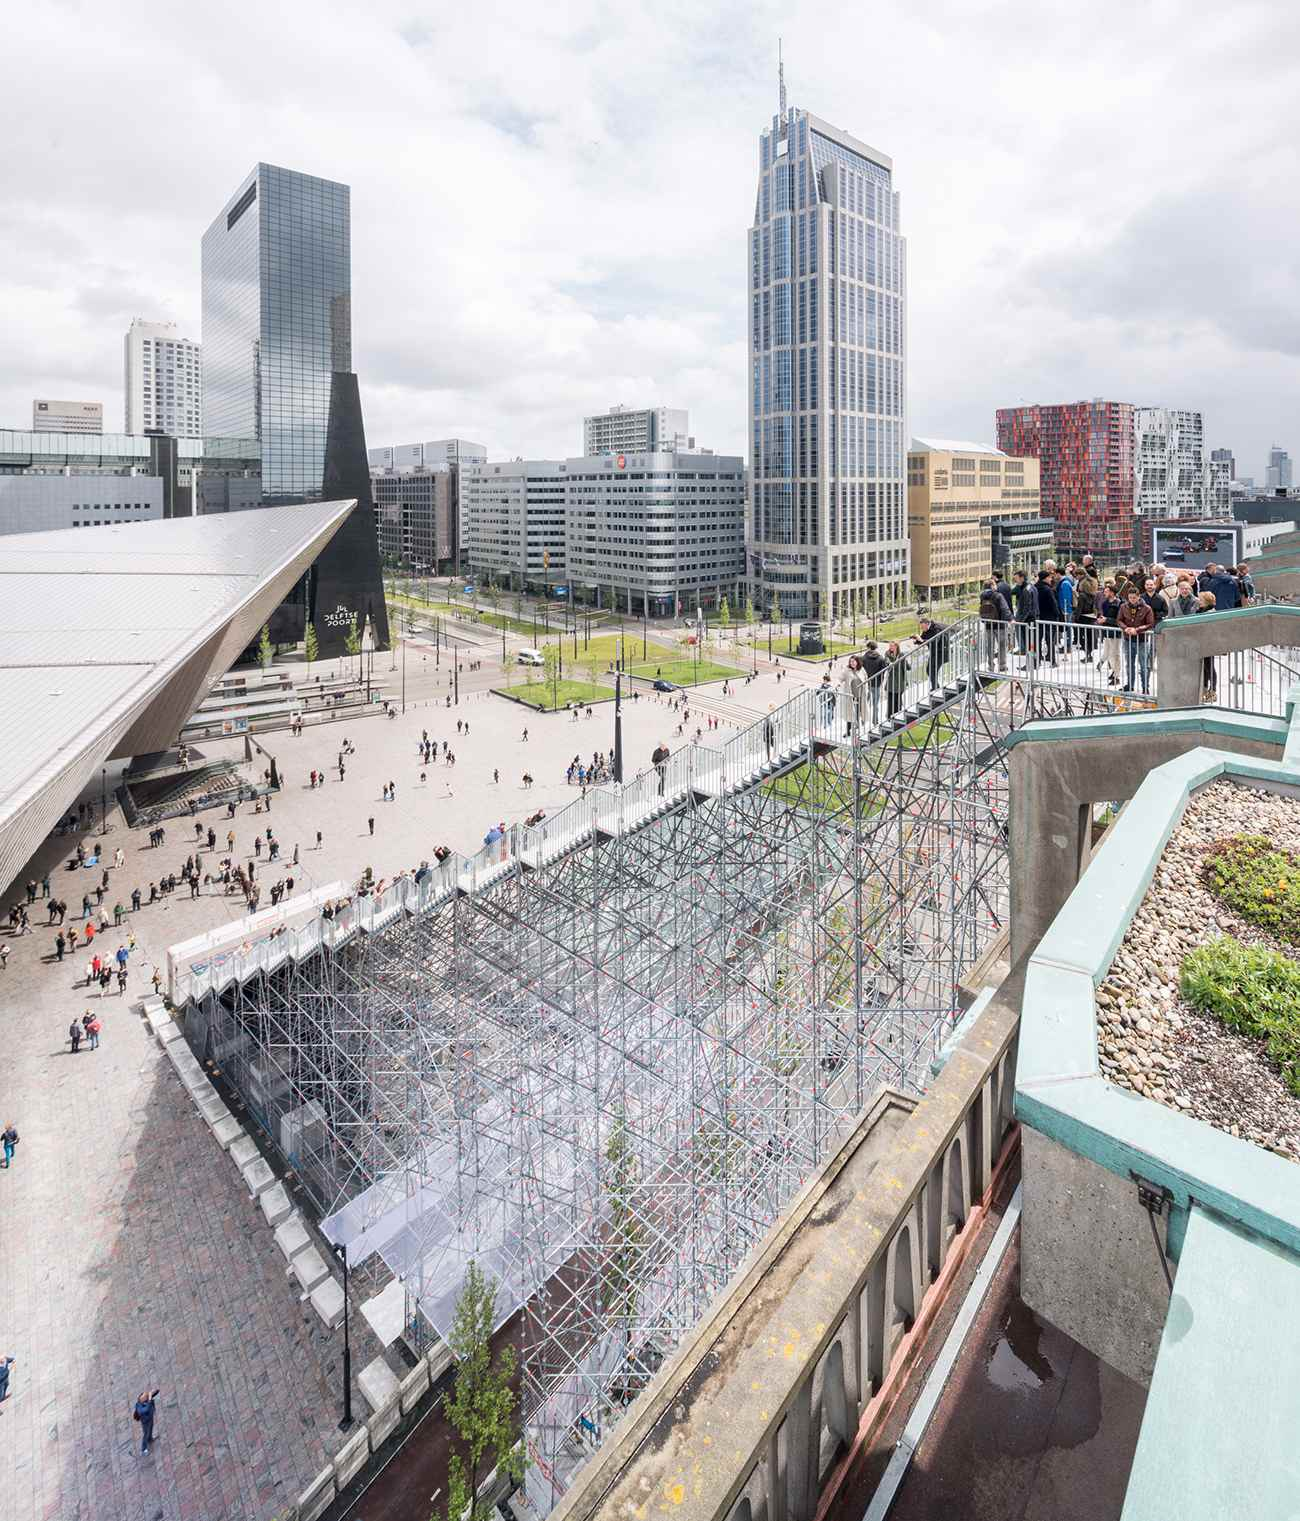 08 De Trap ∏Ossip compressed - Rotterdam : MVRDV cultive l'esprit d'escalier